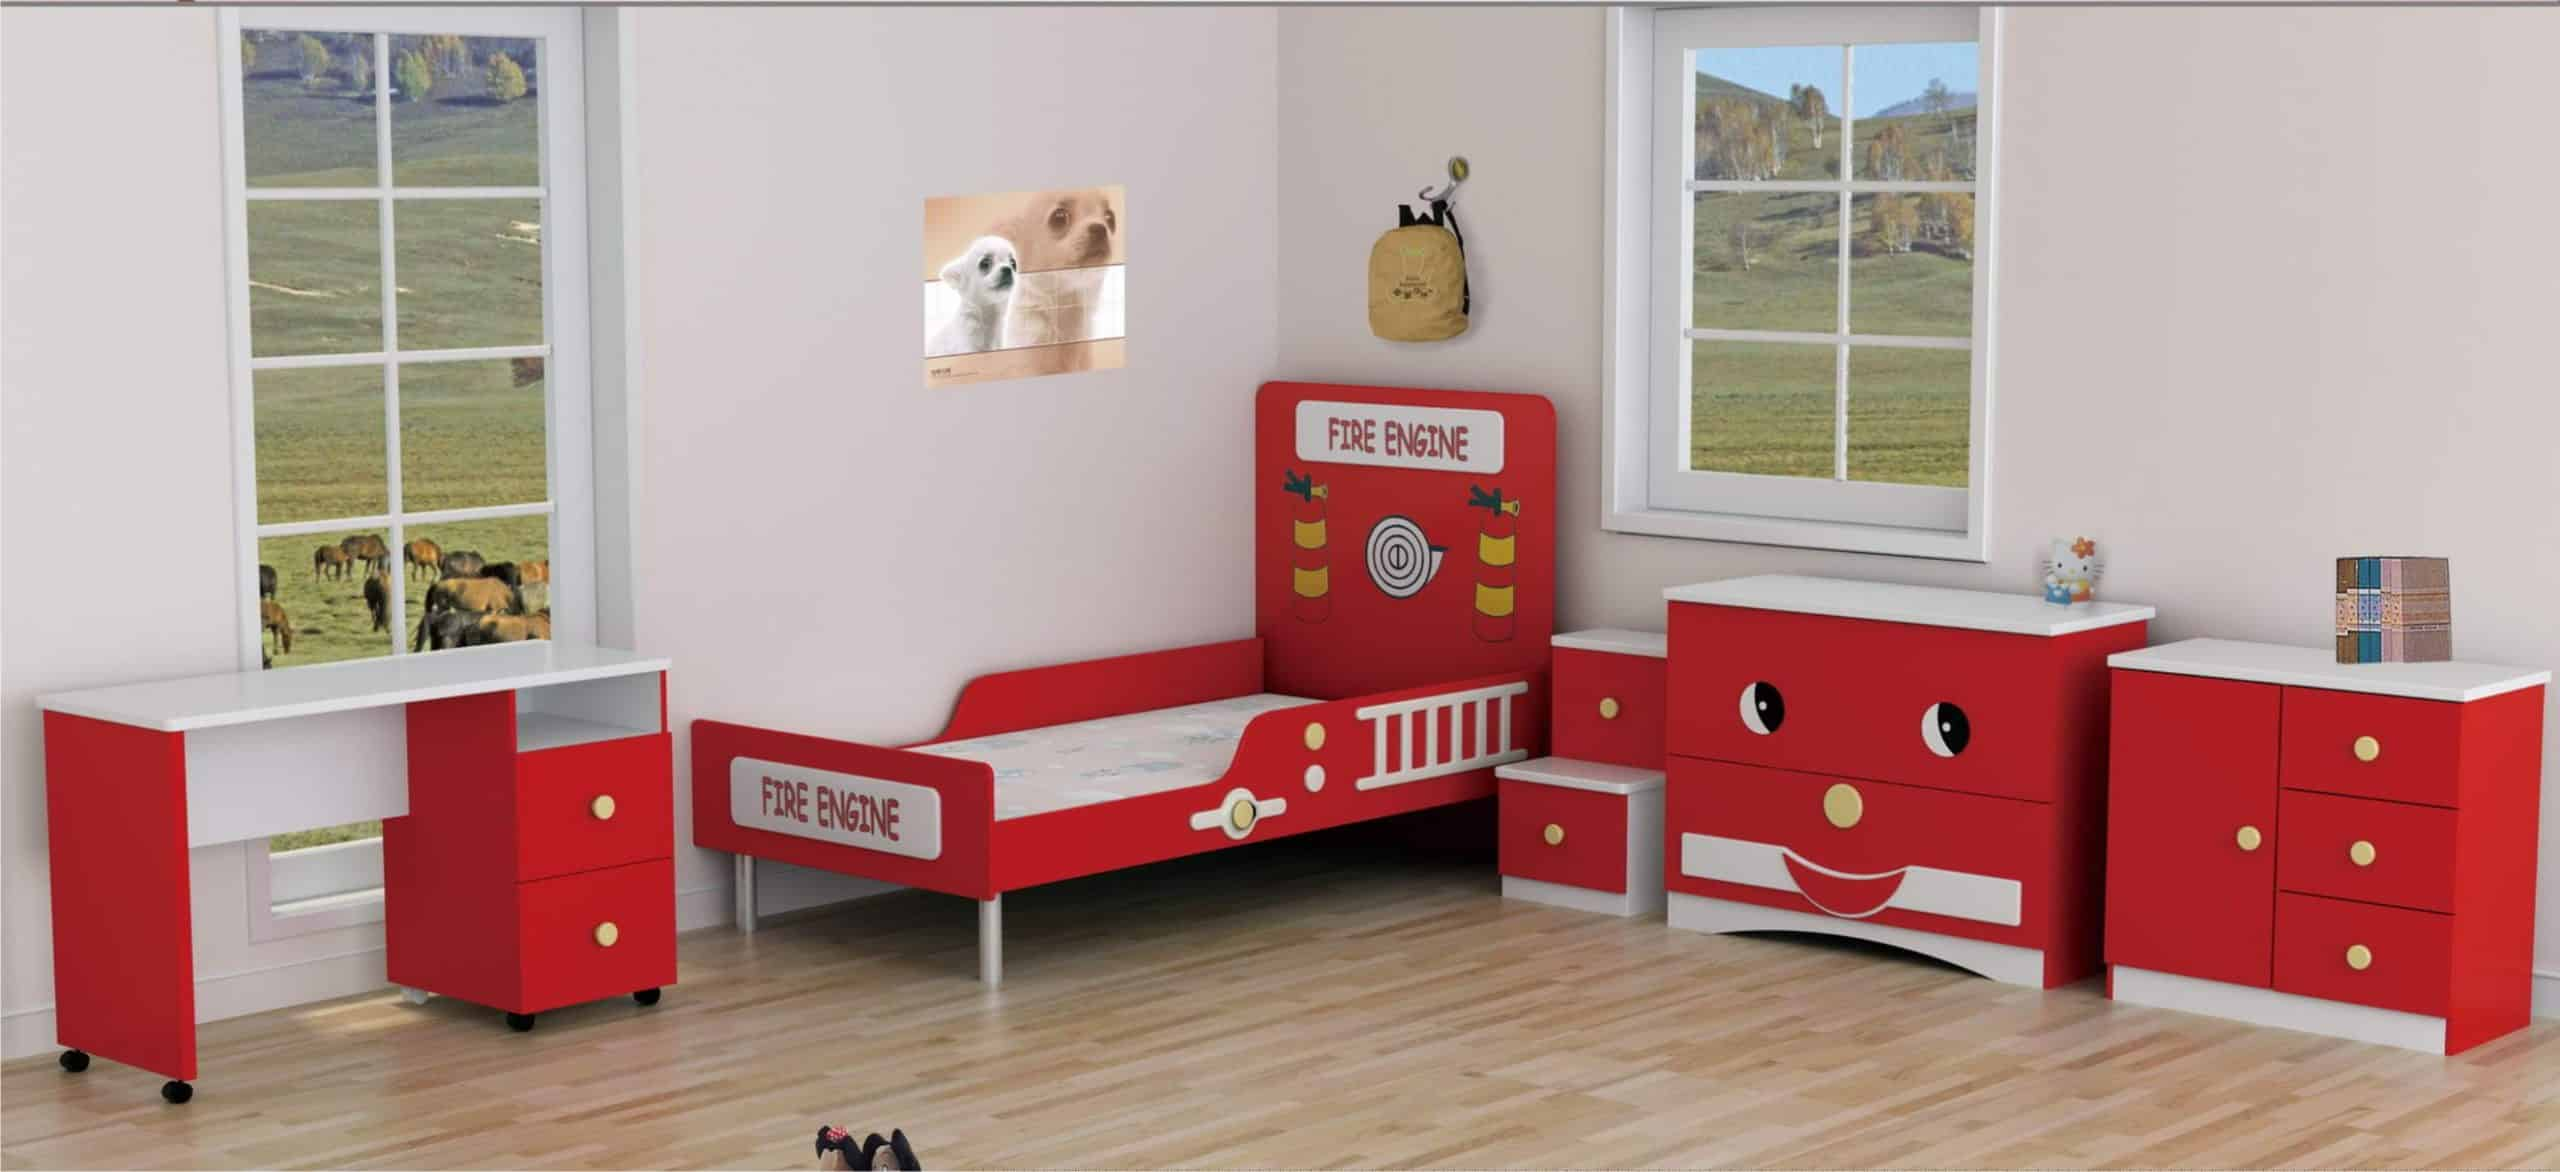 21 modern kids furniture ideas designs designbump. Black Bedroom Furniture Sets. Home Design Ideas